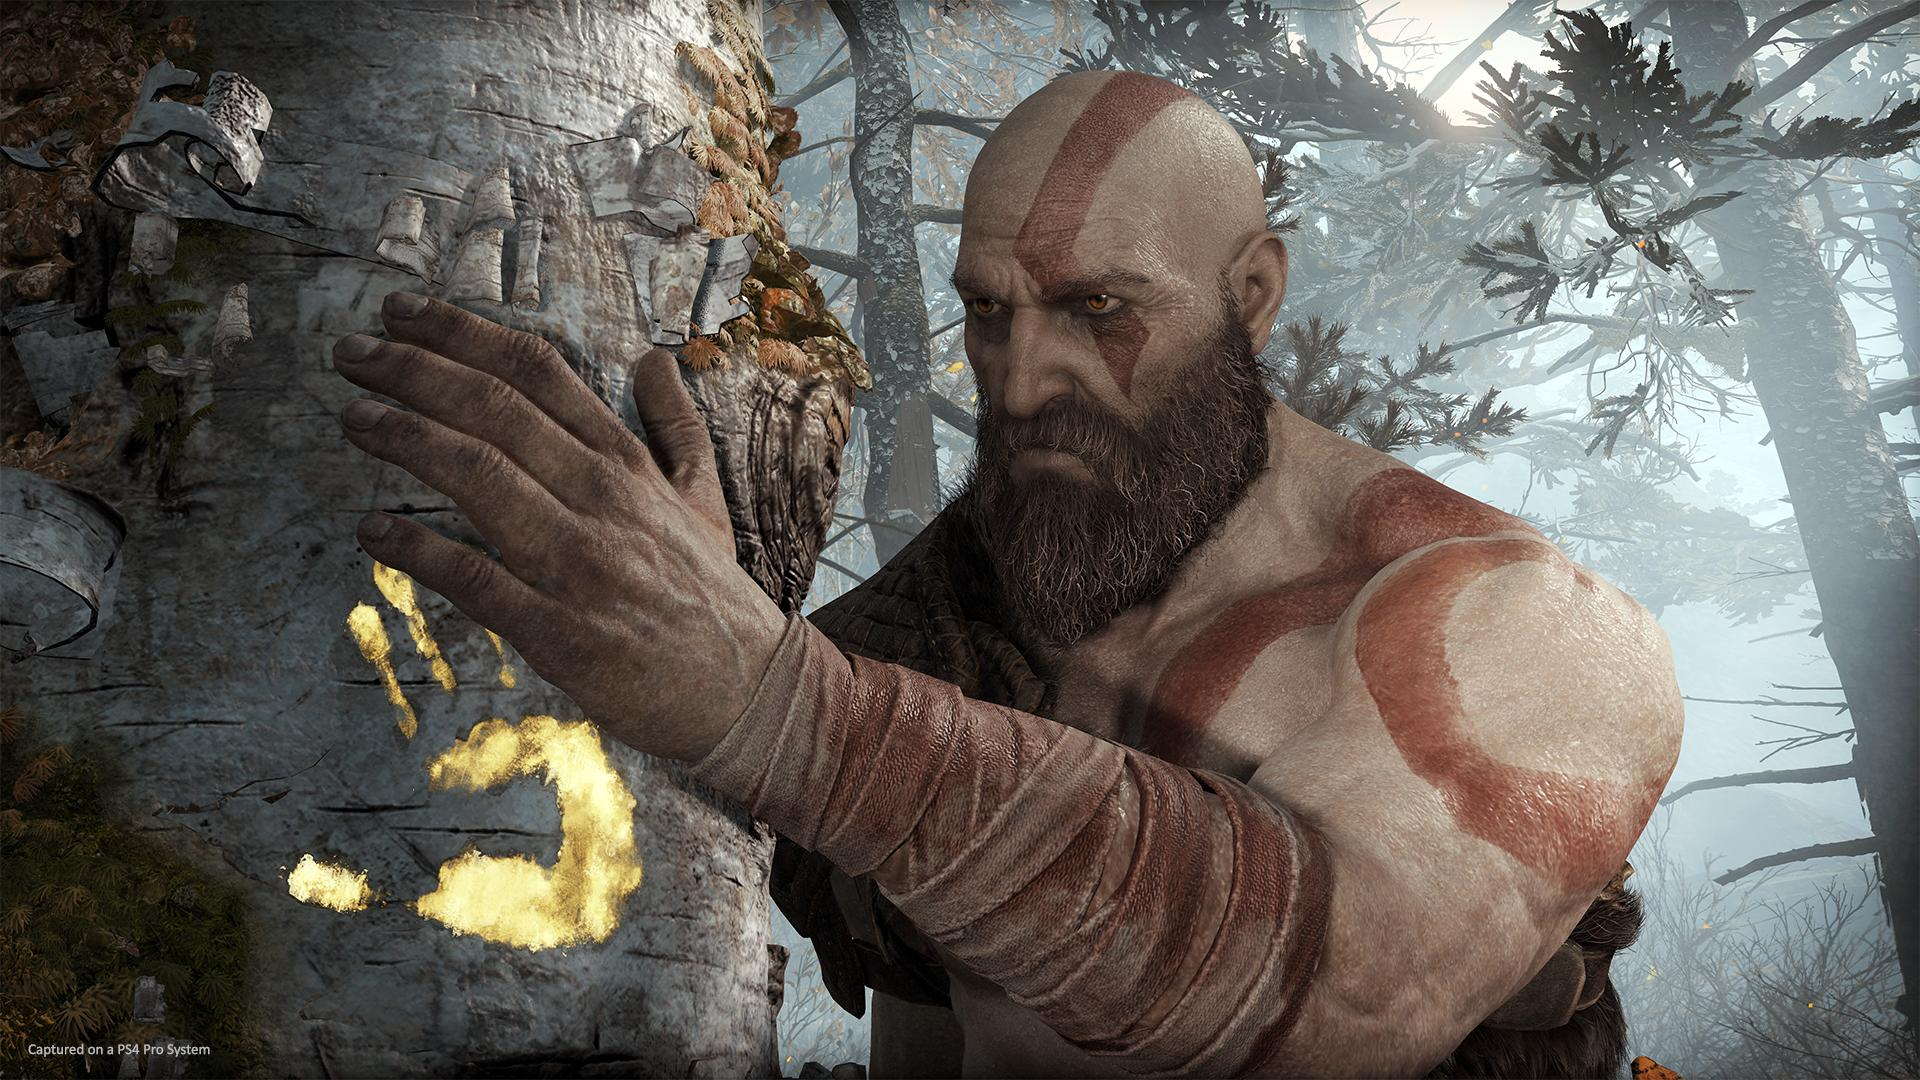 1440x2960 Kratos God Of War 4 Samsung Galaxy Note 9 8 S9 S8 S8 Qhd